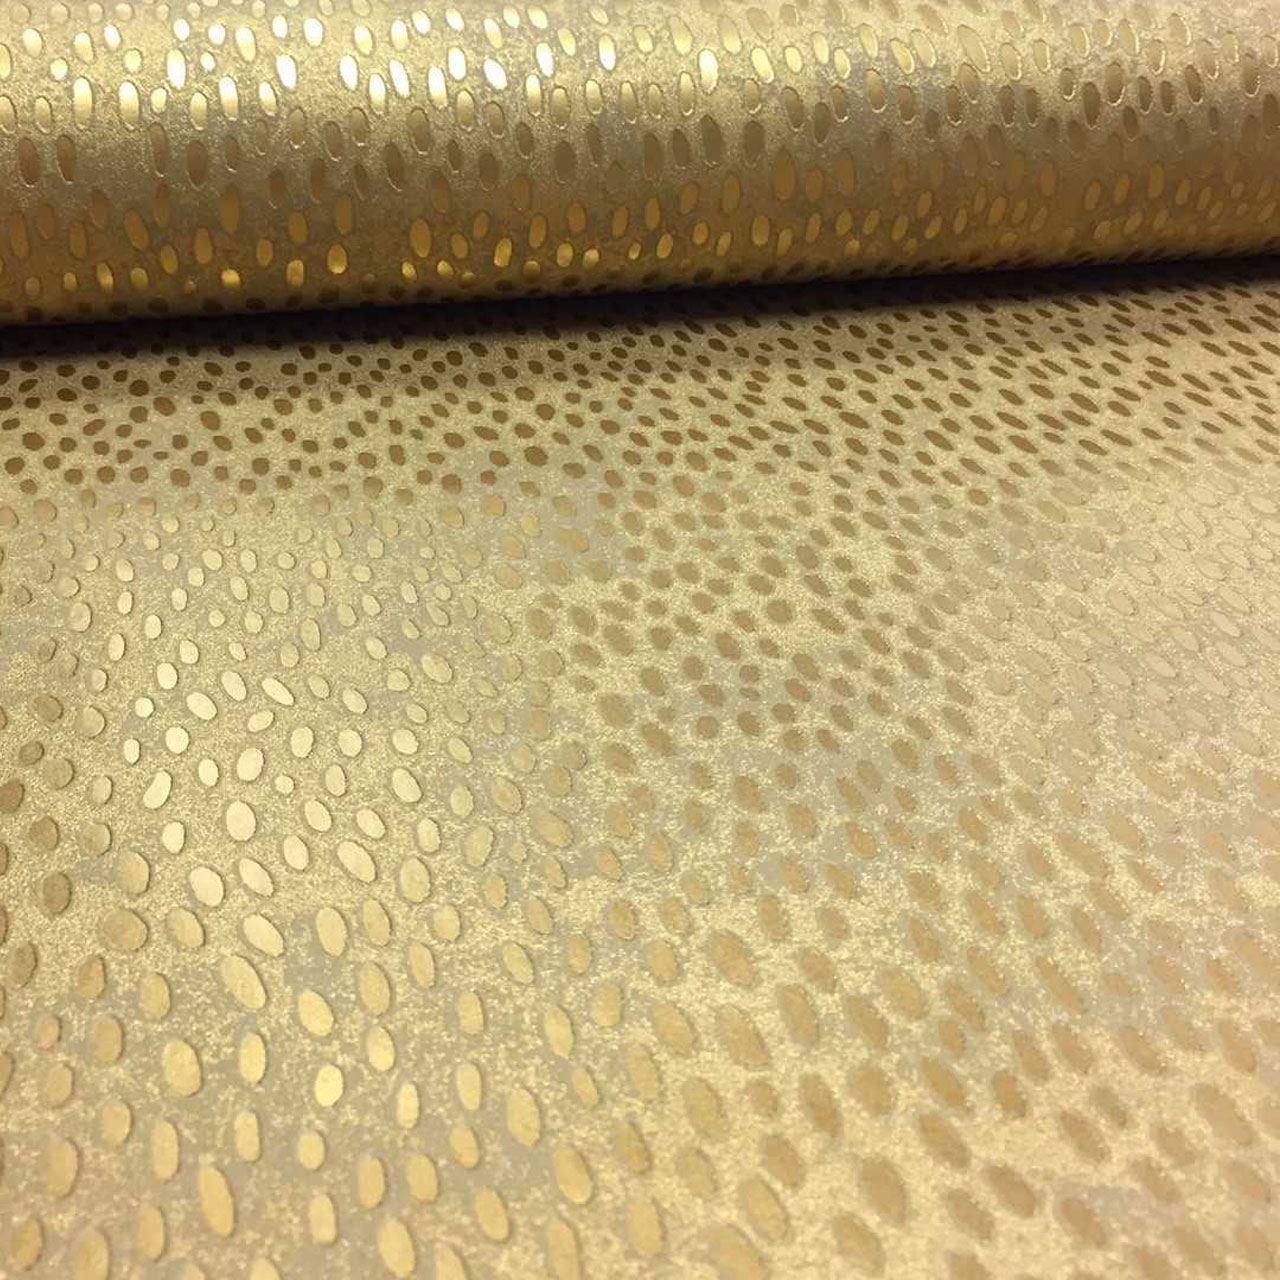 Shiny-Metallic-Scales-Wallpaper-Textured-Finish-Luxury-Modern-Paste-The-Wall thumbnail 4